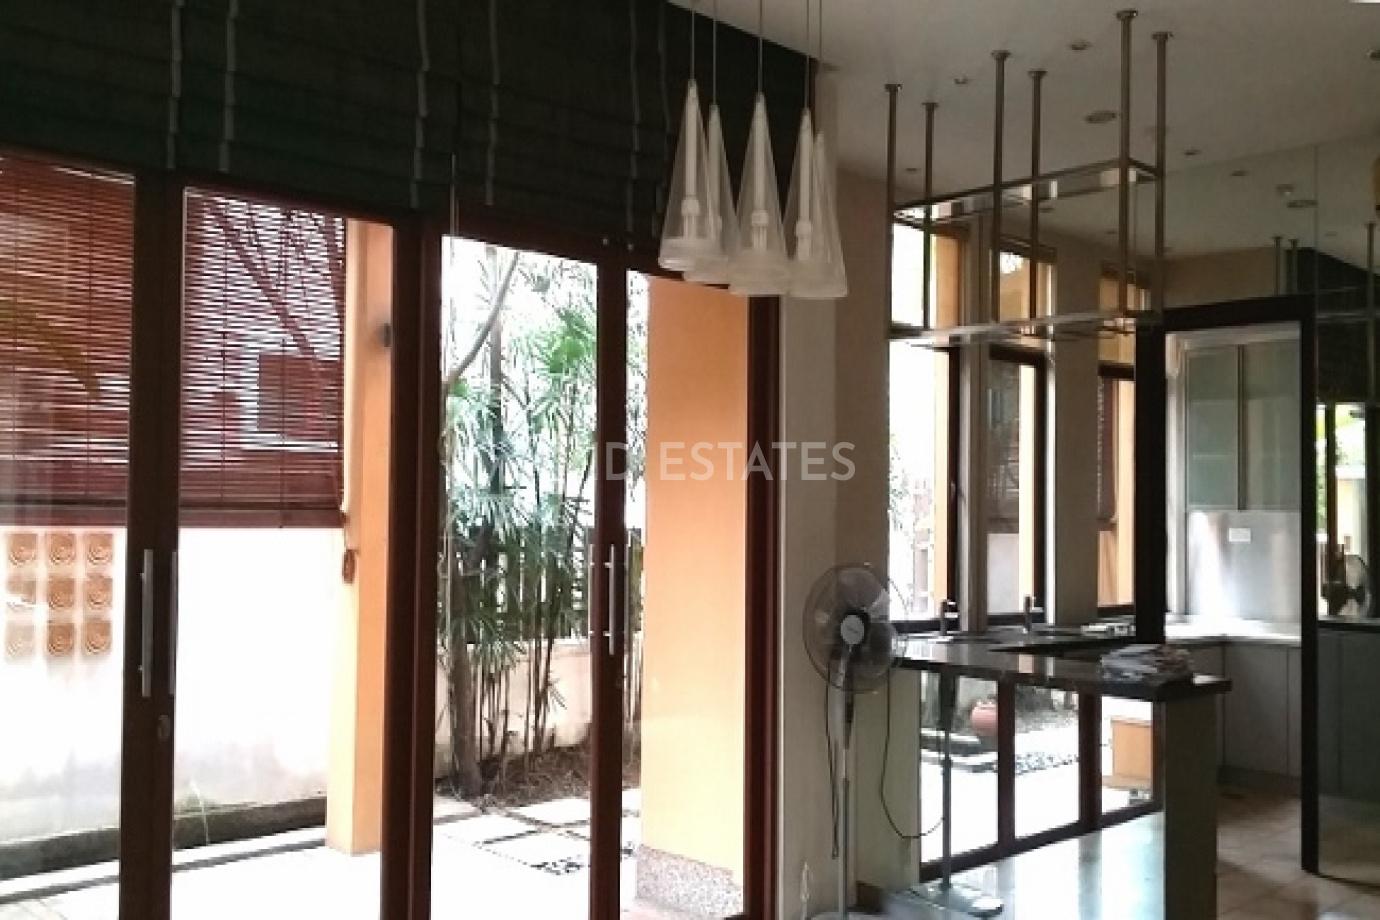 Duta Nusantara,Kuala Lumpur, 5 Bedrooms Bedrooms, ,4 BathroomsBathrooms,Semi-Detached,To Let,Jalan Sri Hartamas 1, Off Jalan Duta,1137